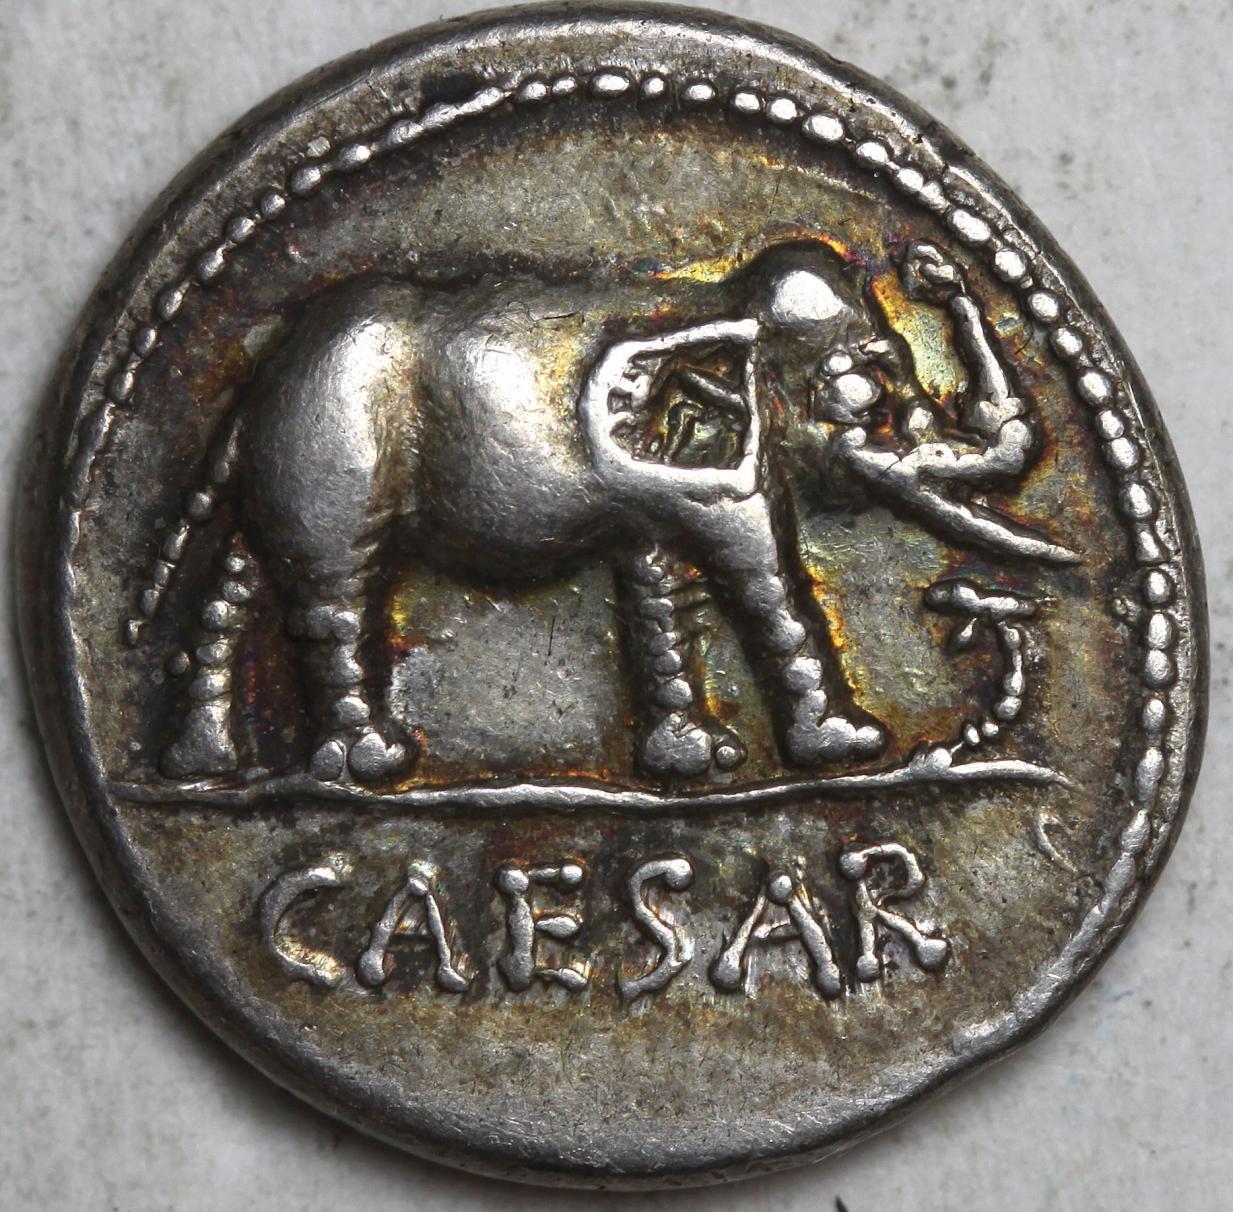 www.cointalk.com